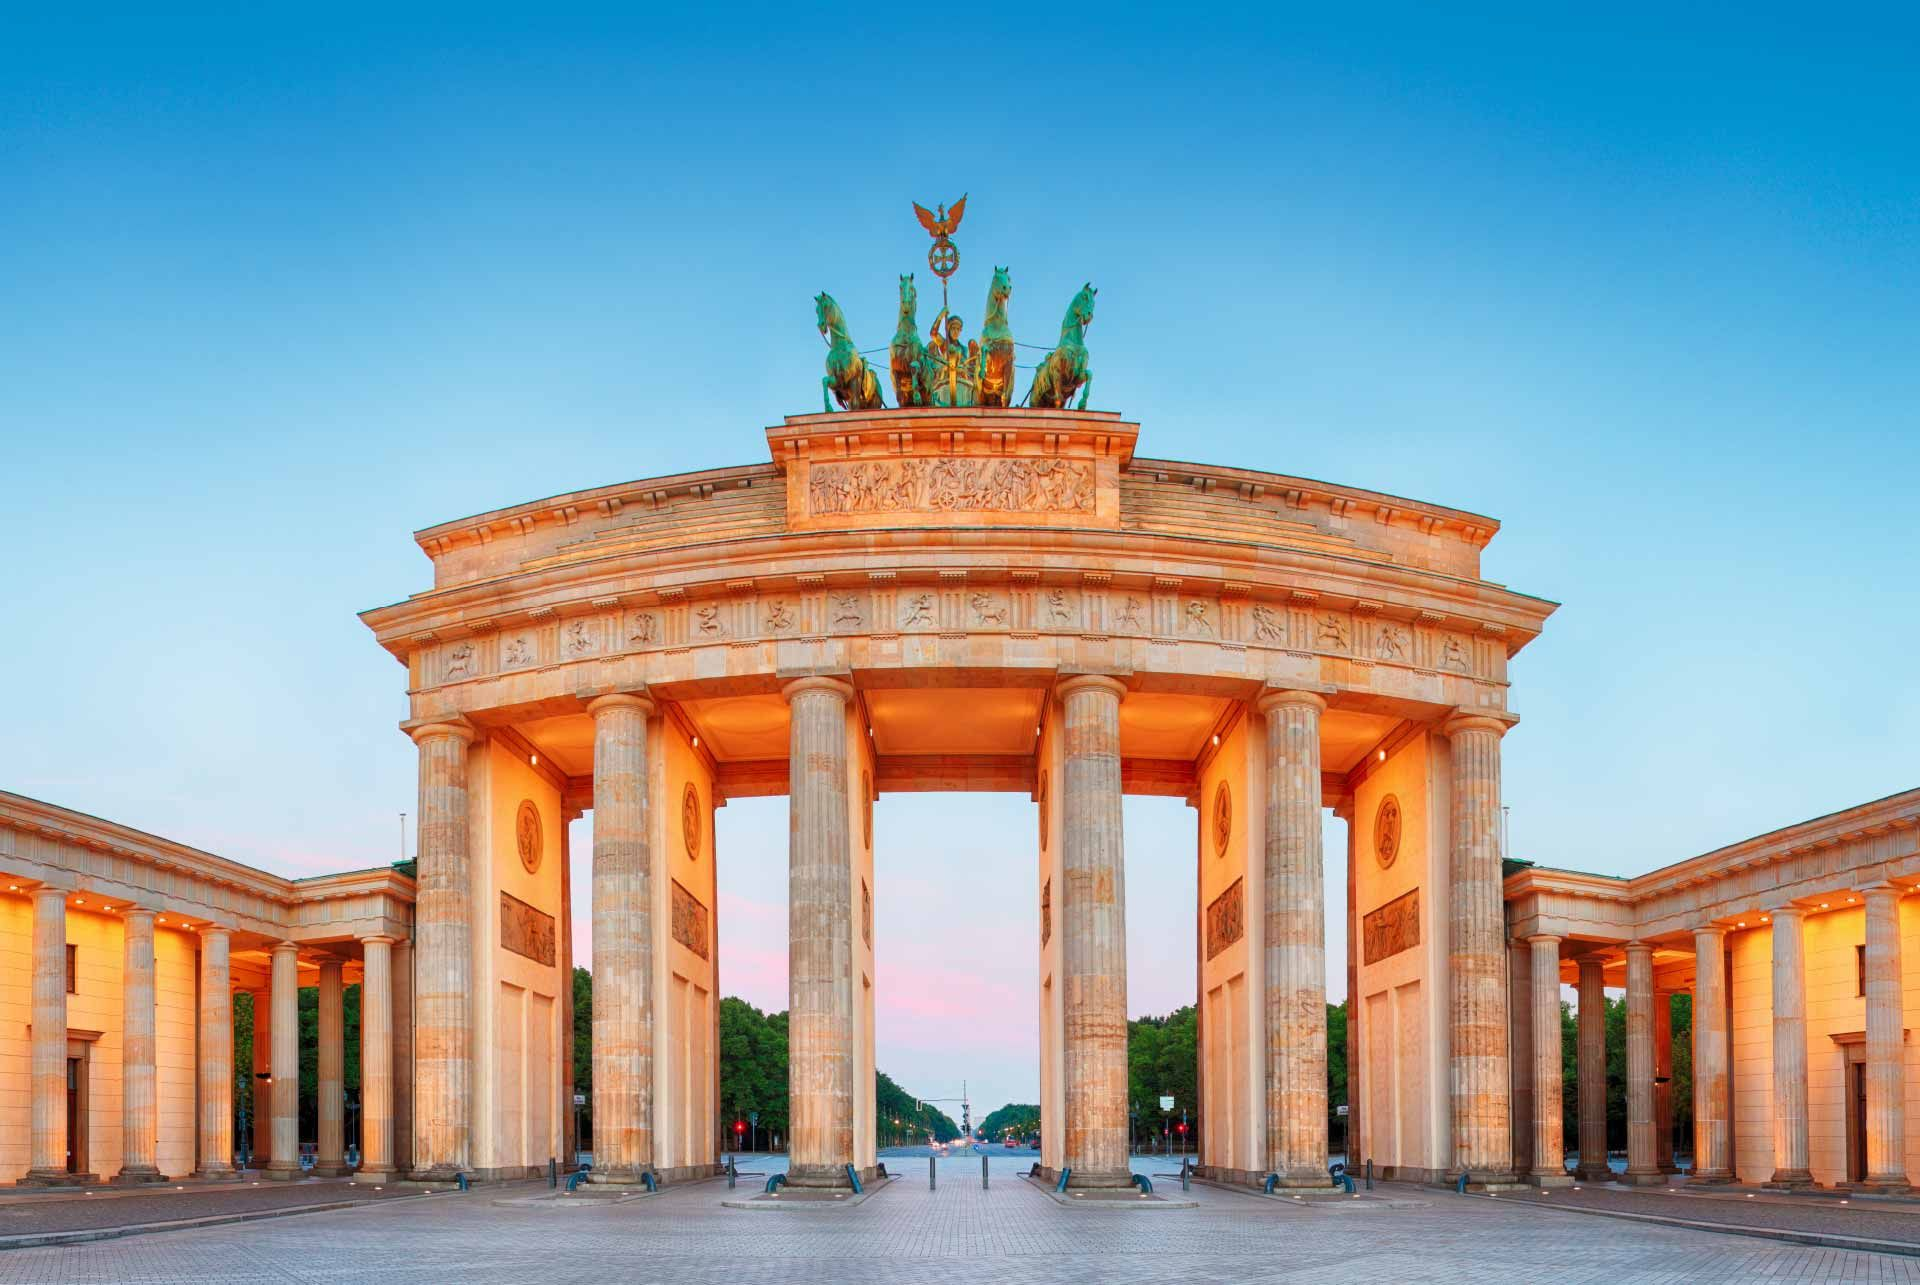 Walking tour of Berlin